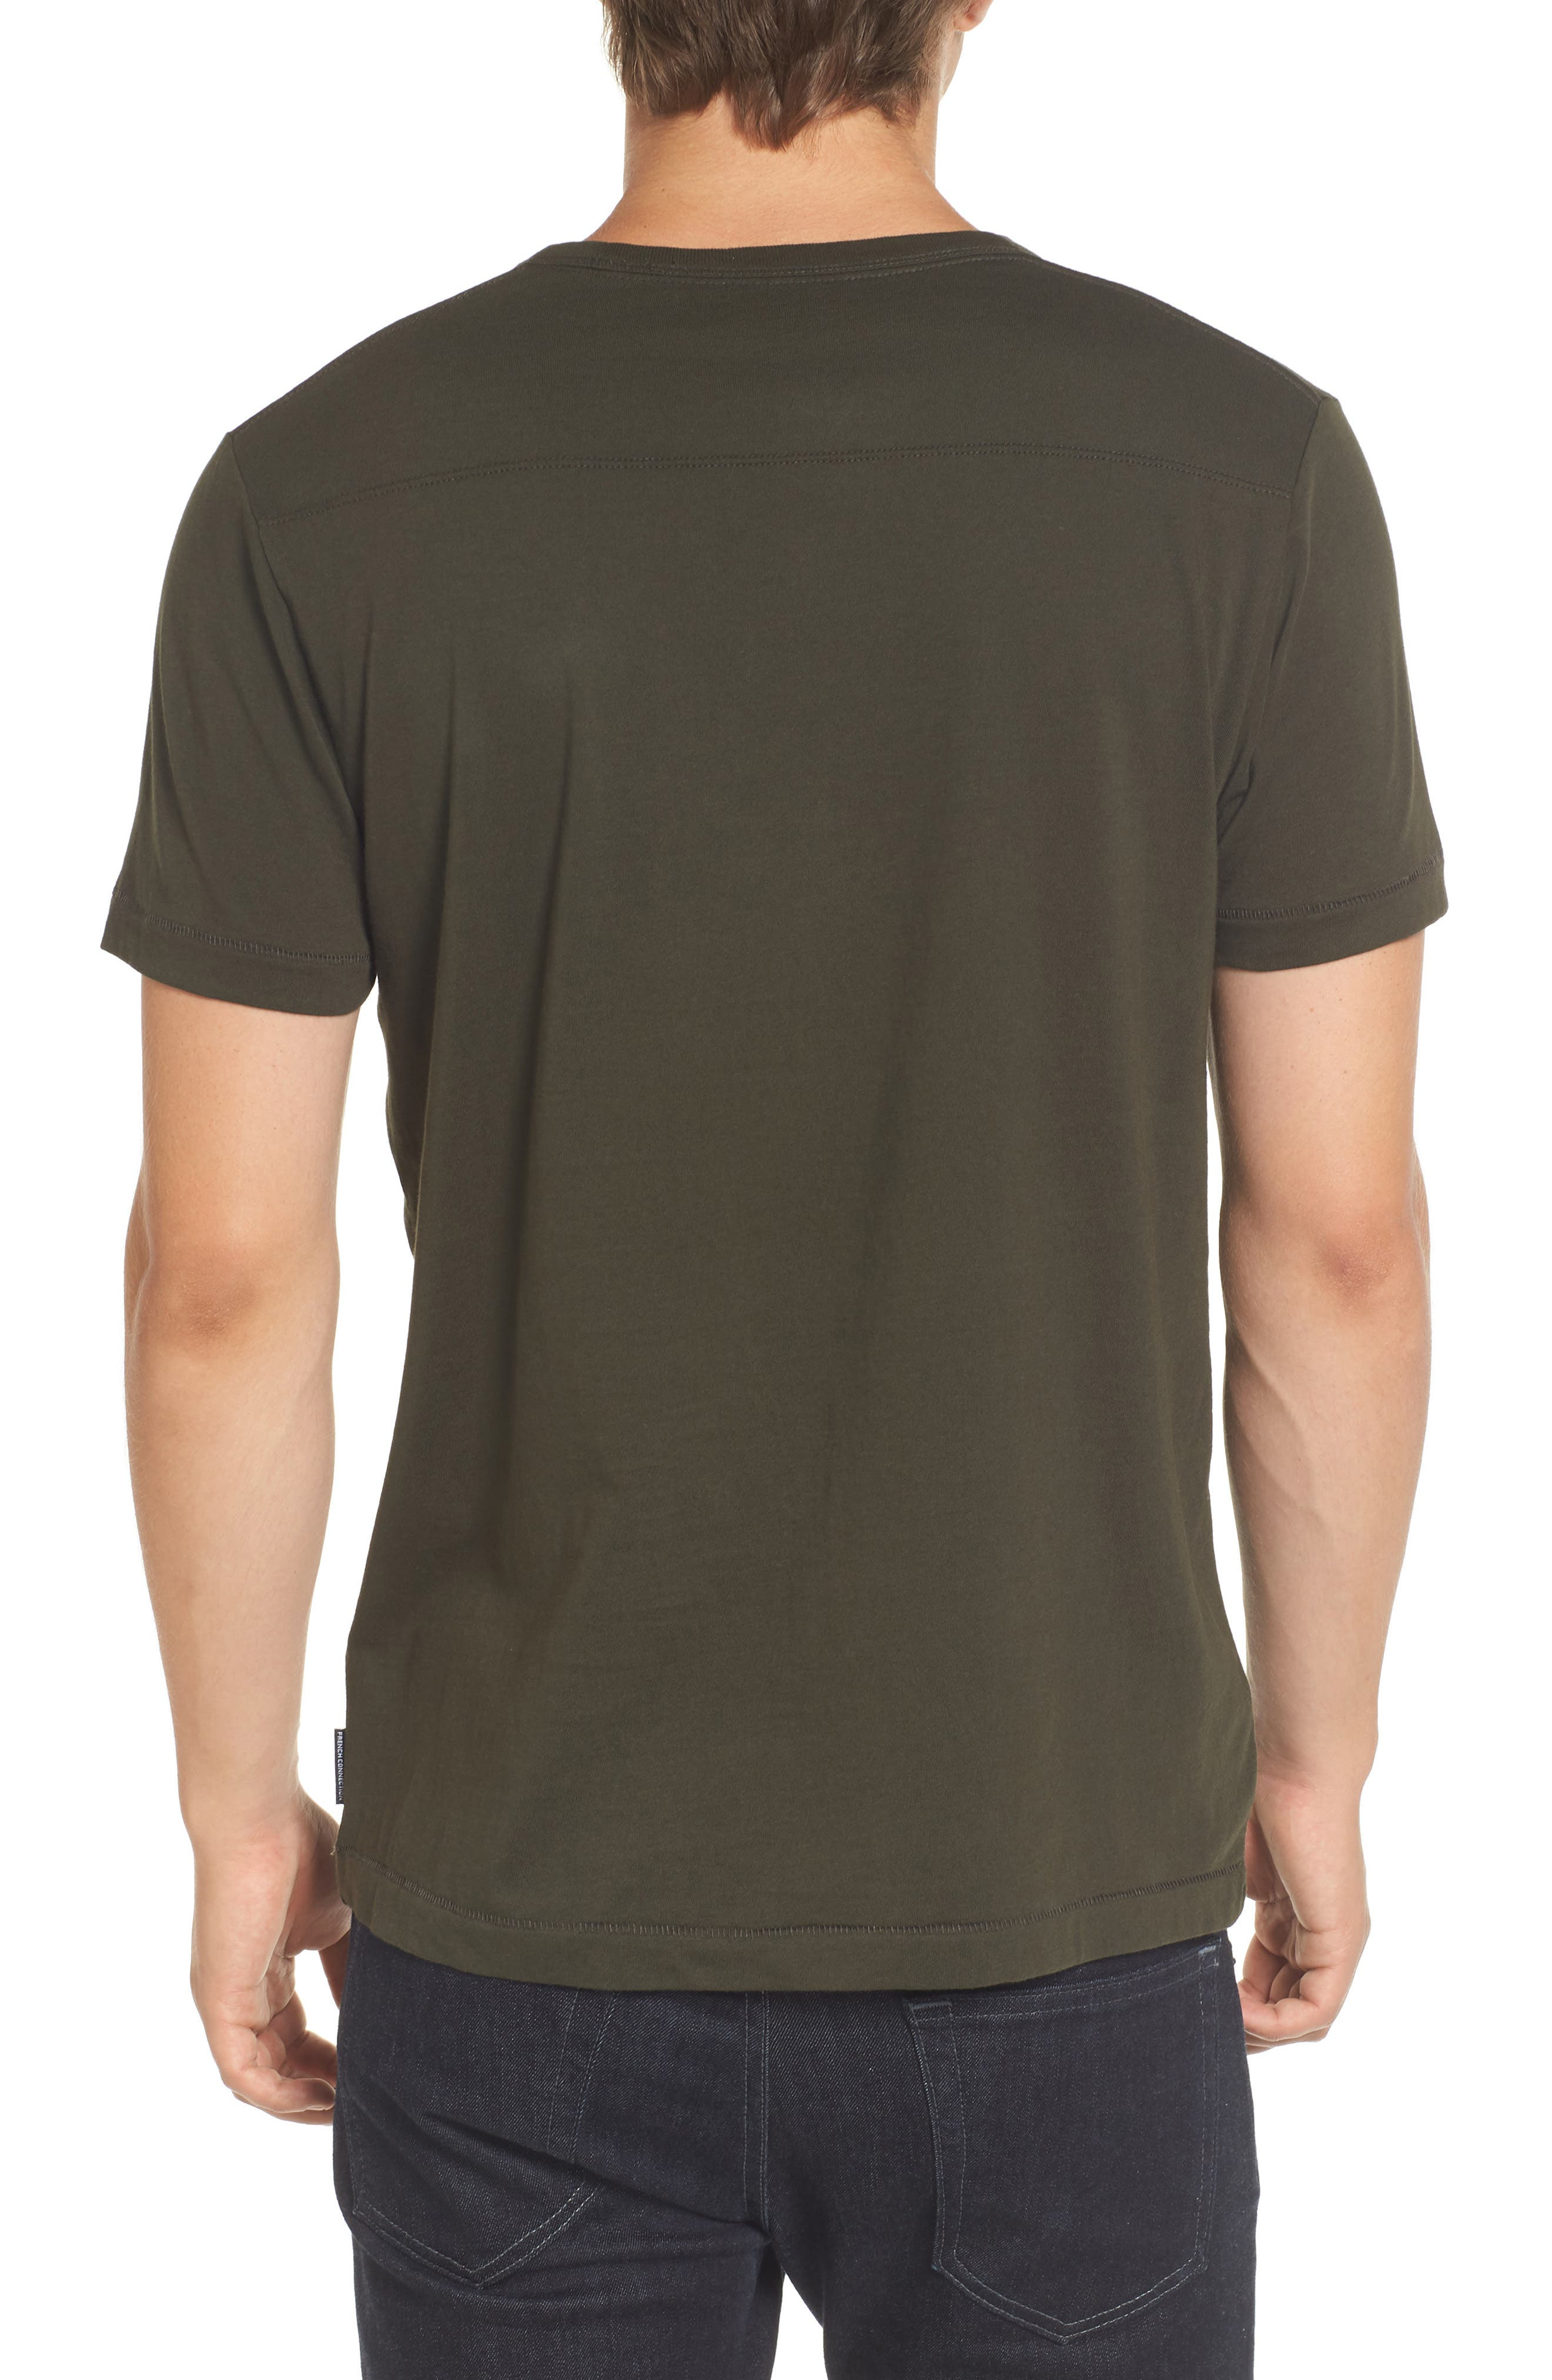 Alternate Image 2  - French Connection Slim Fit Crewneck T-Shirt